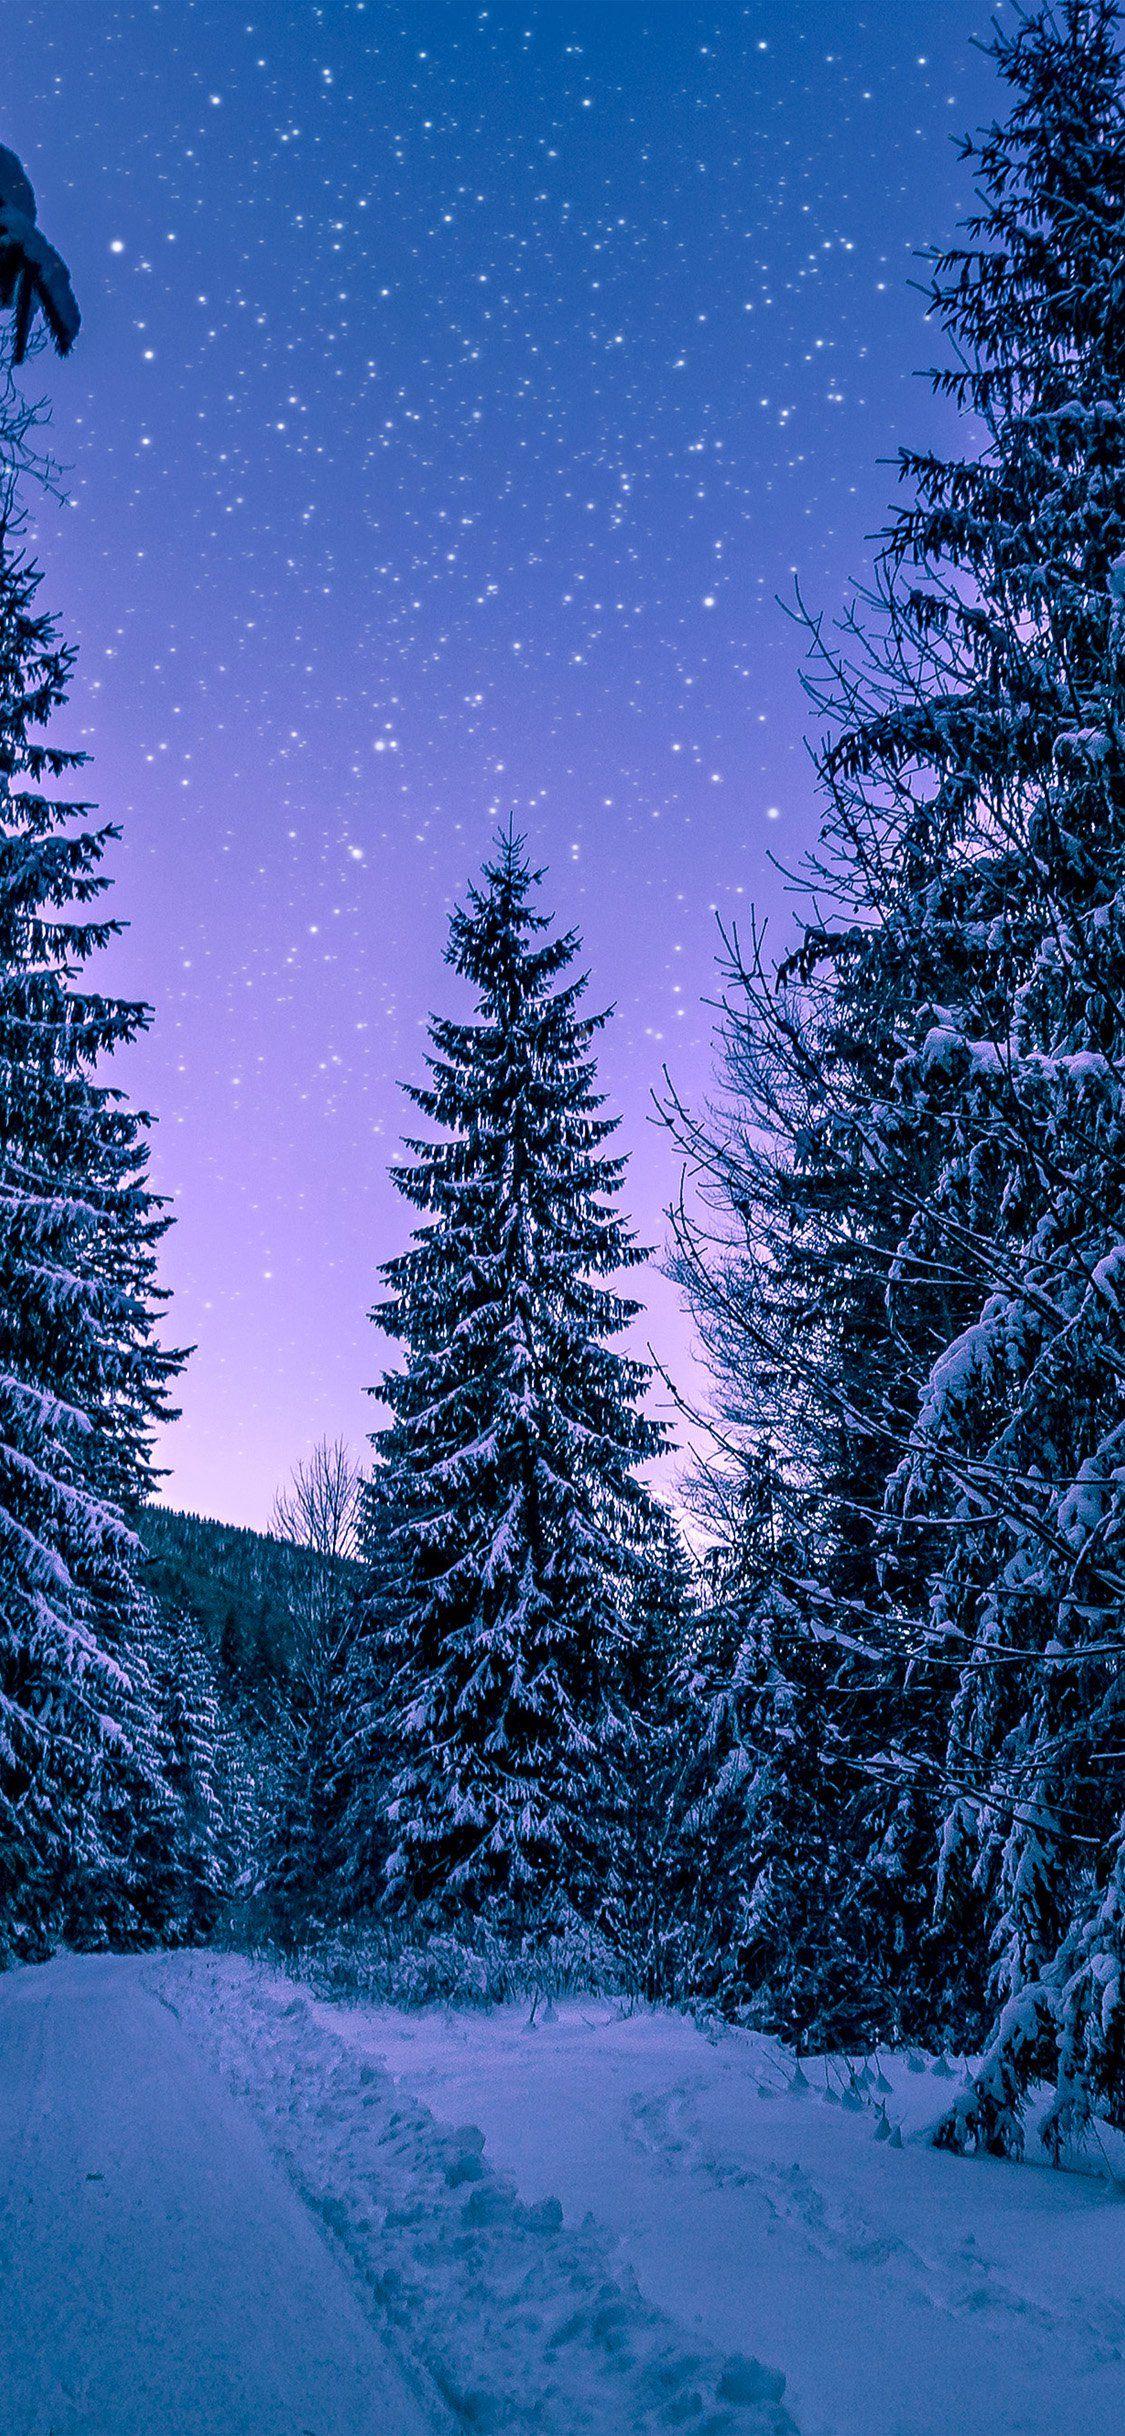 Pin By Bethesda Aritonang On Menarik In 2020 Iphone Wallpaper Winter Winter Wallpaper Winter Wood